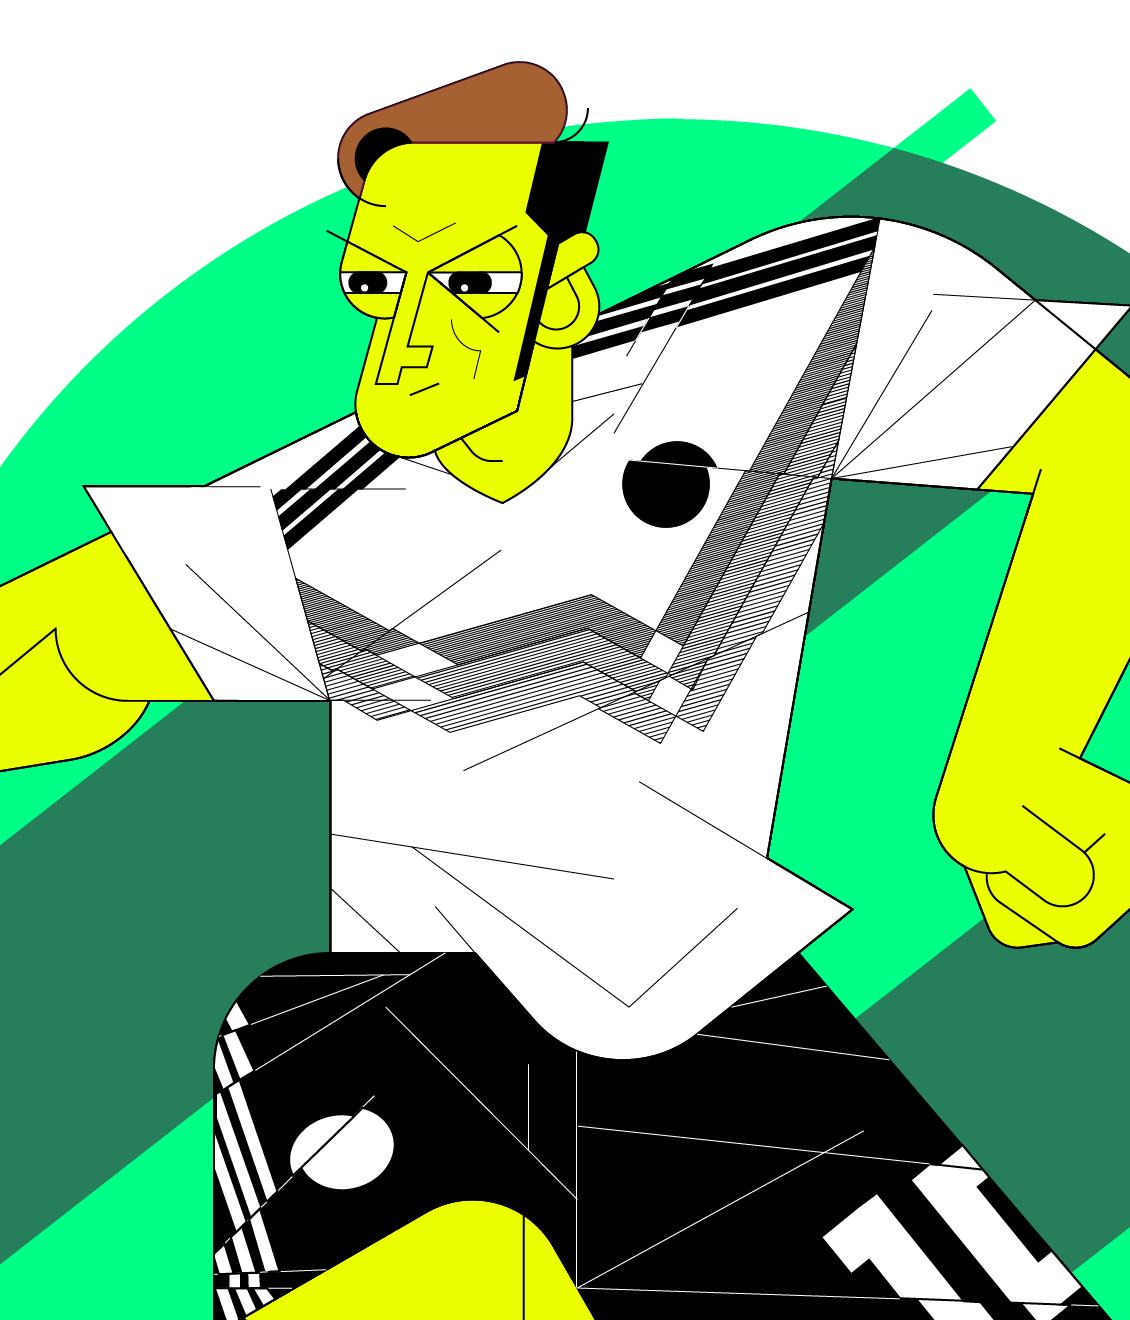 Football Players_Mesut Özil studies_Germany final close up.png